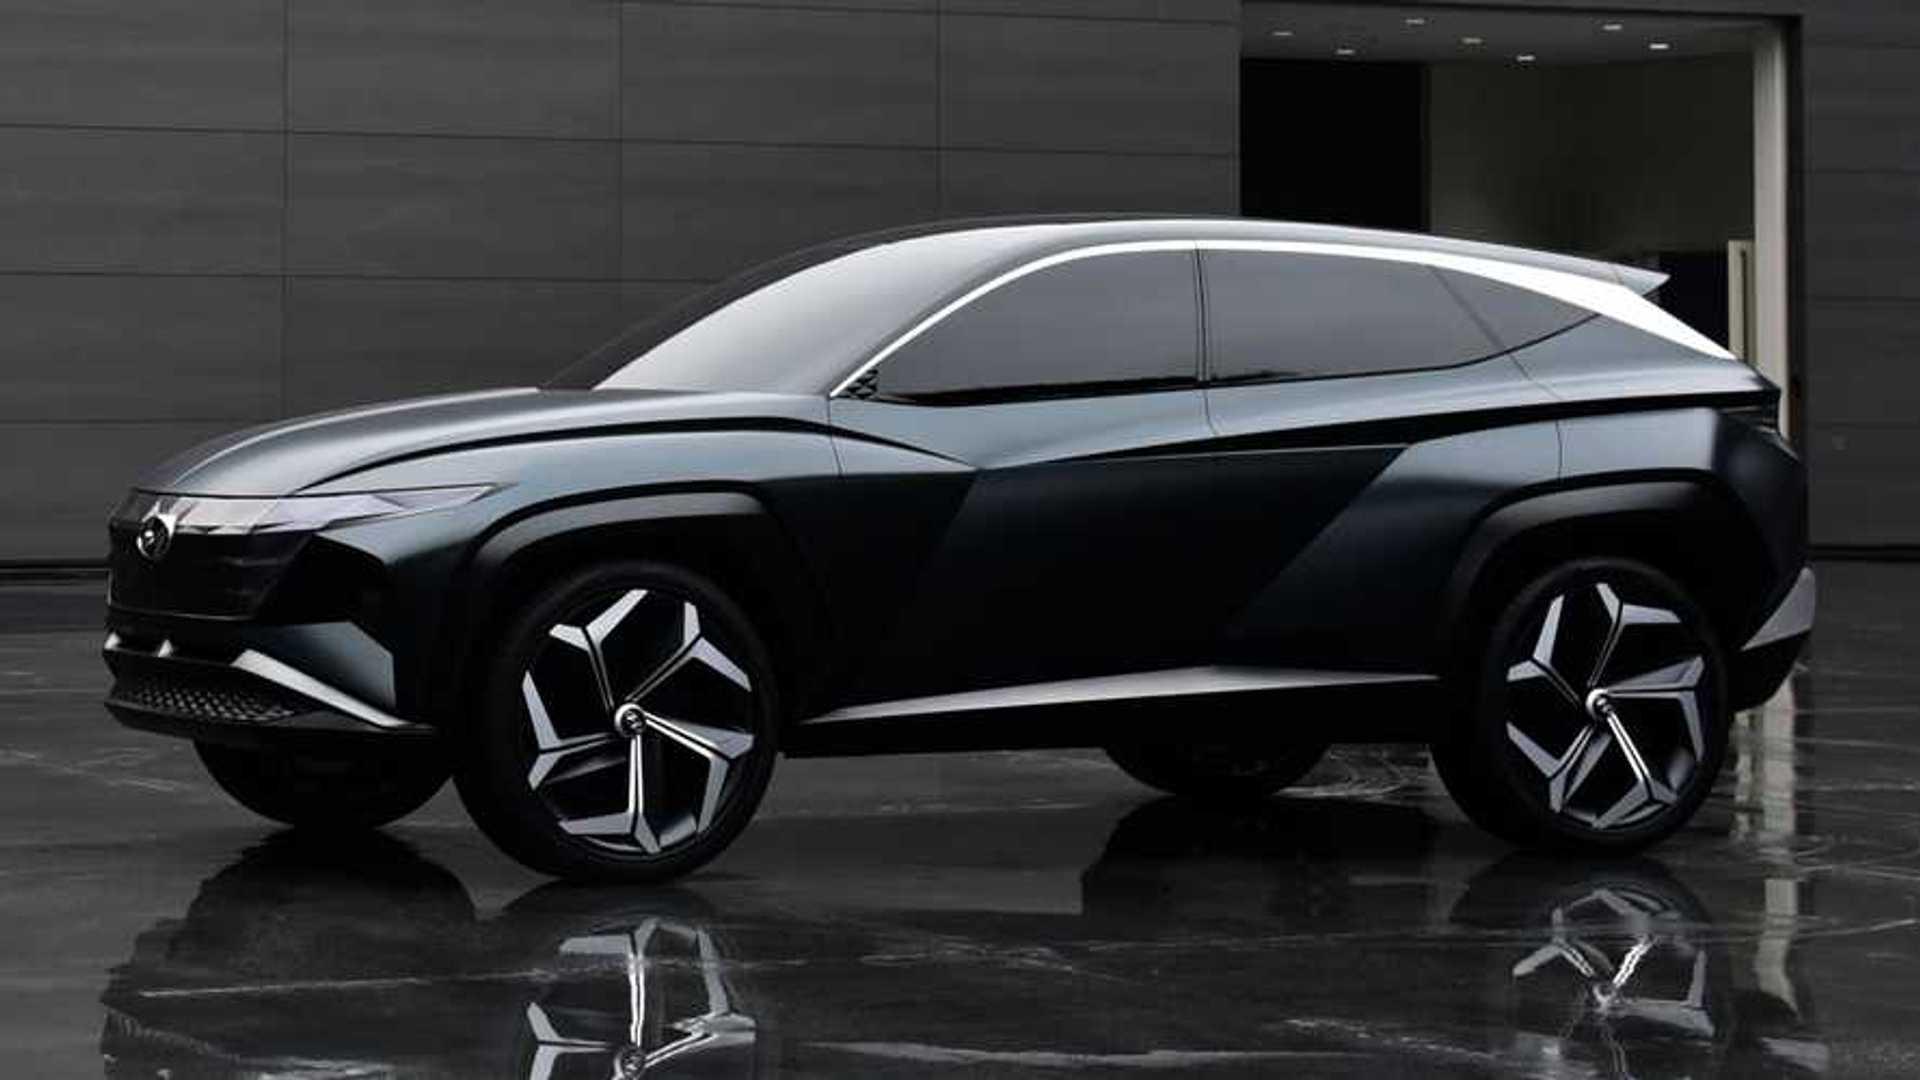 Hyundai Vision T Concept Previews Brand's Future SUV Design Language